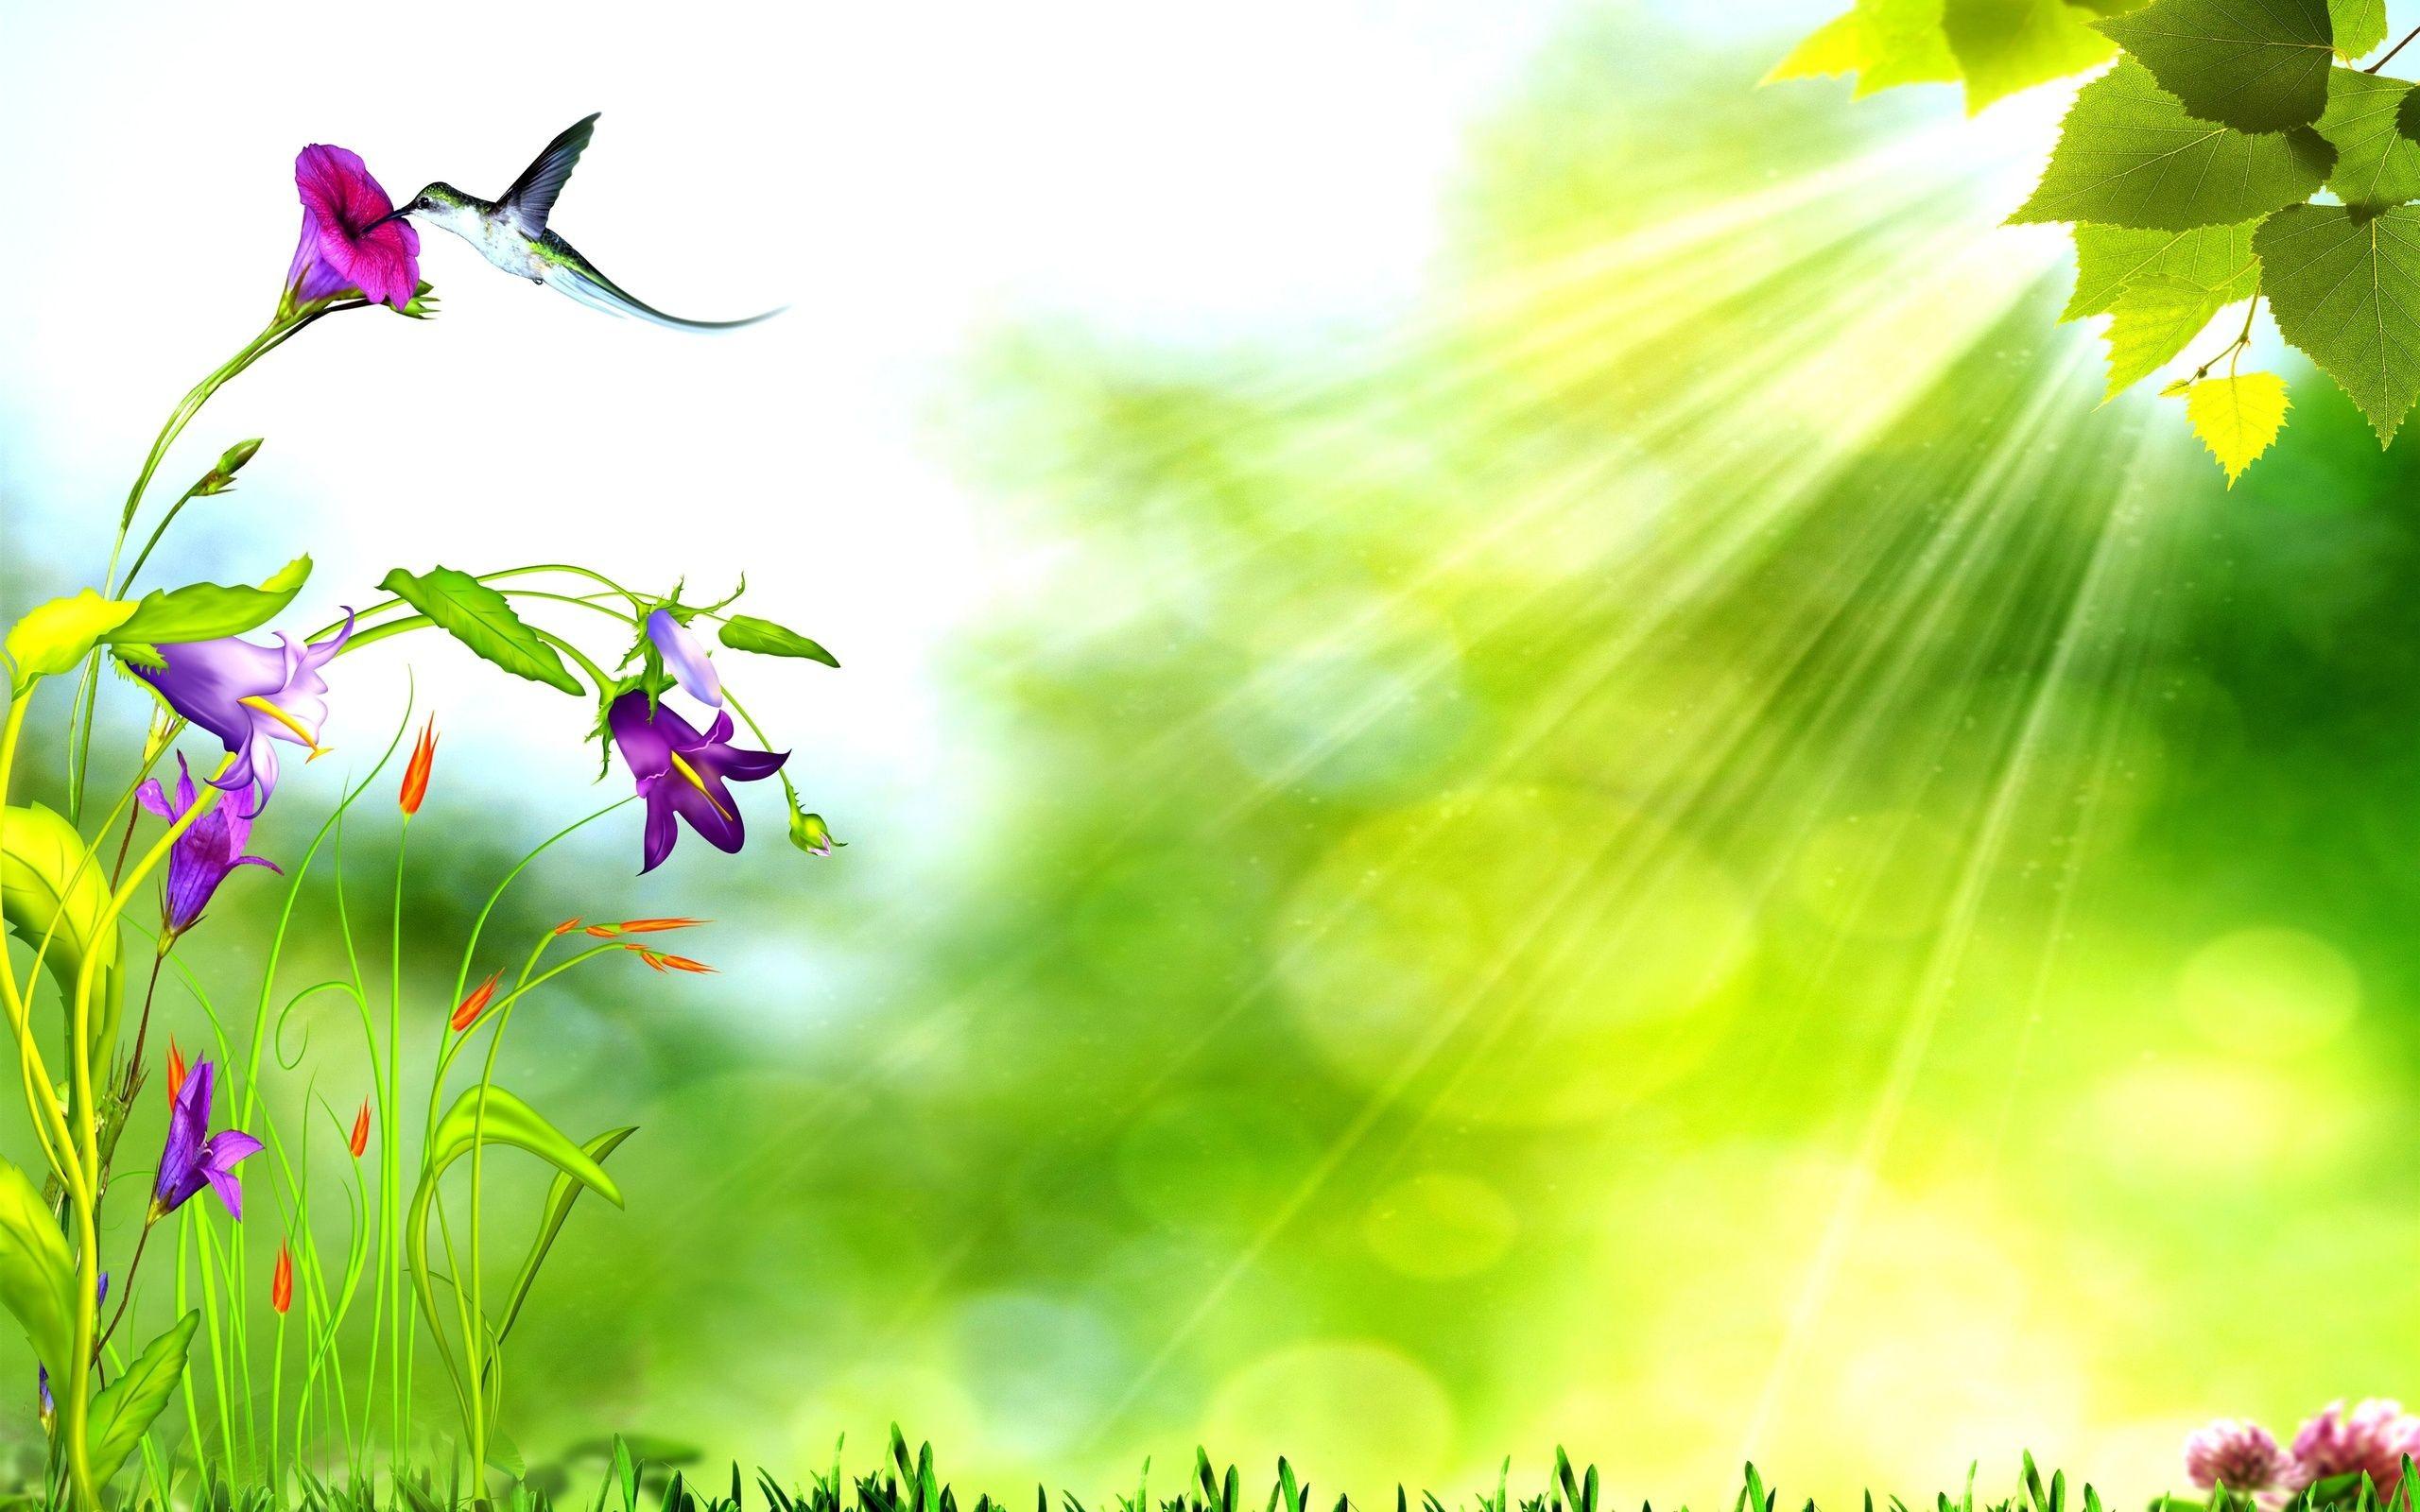 Nature Background Image (57+ images)